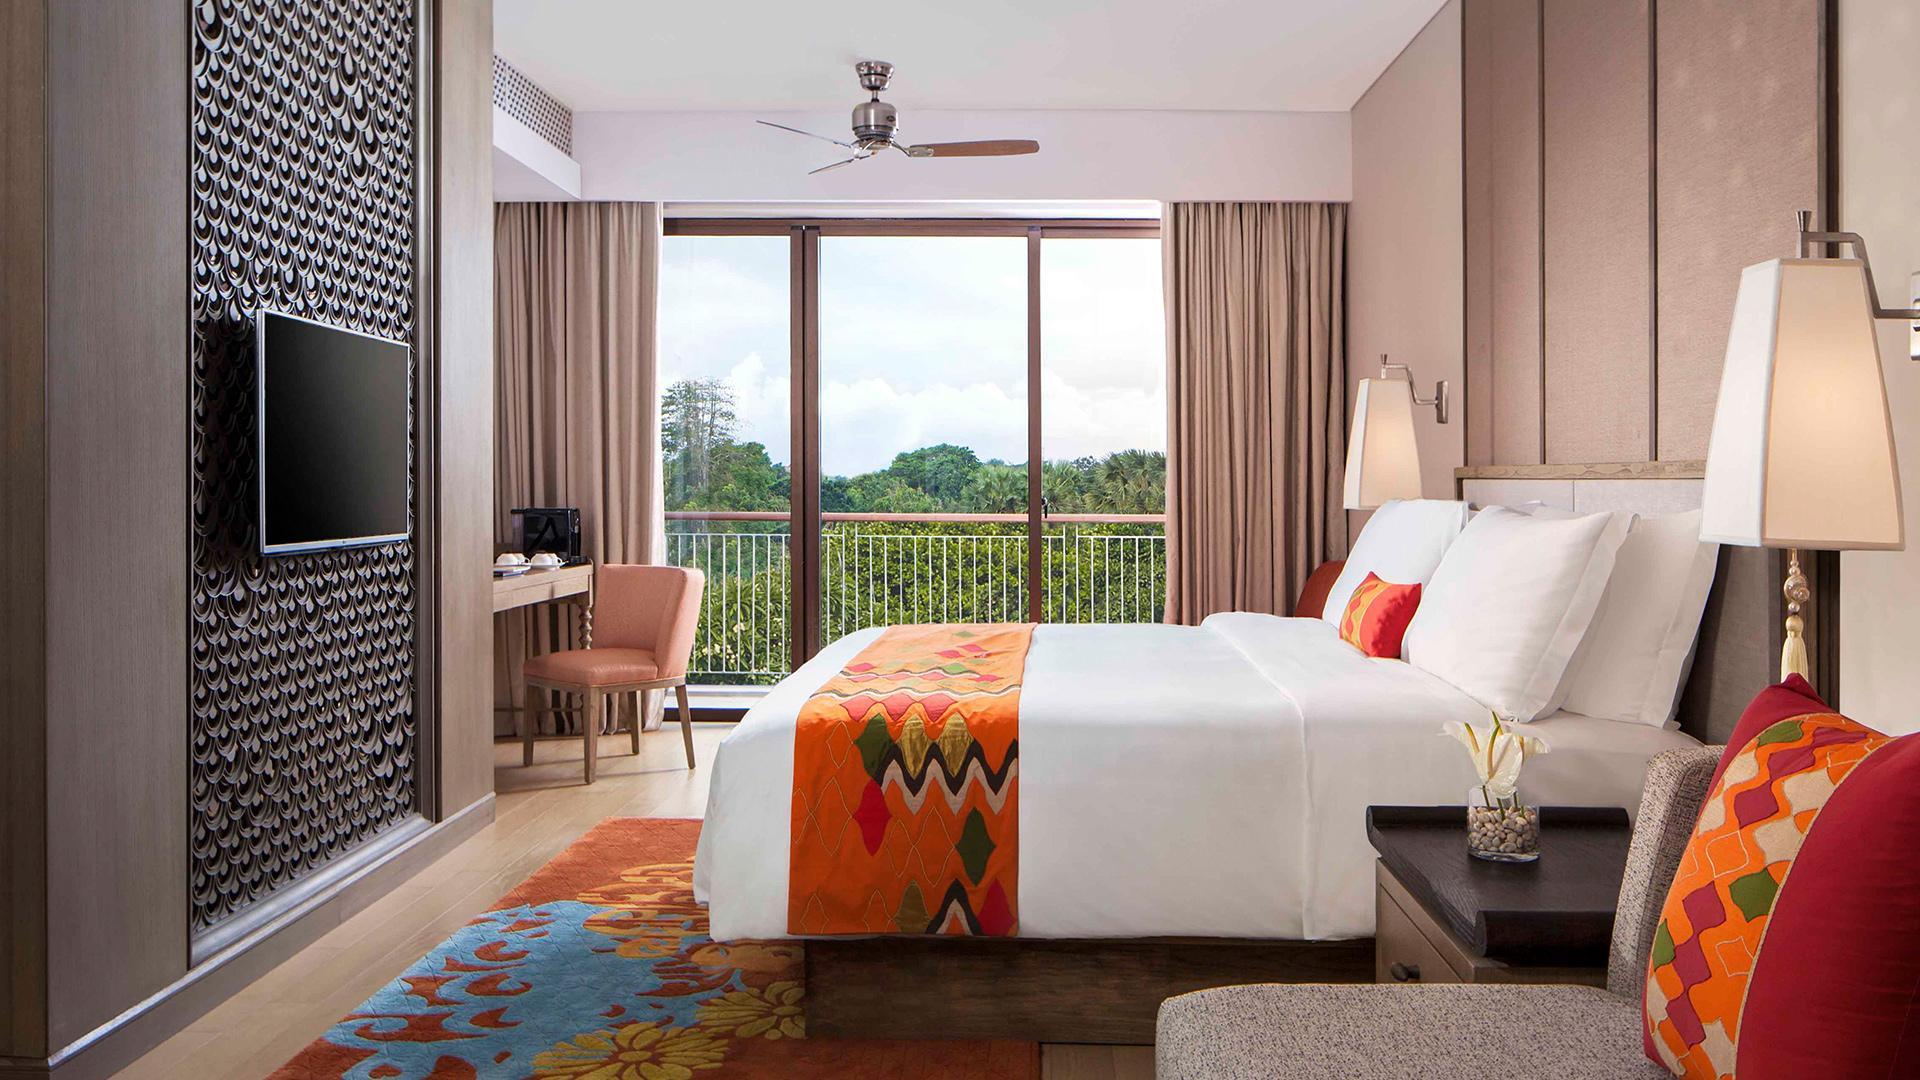 Junior Suite image 1 at Mövenpick Resort & Spa Jimbaran Bali by Kabupaten Badung, Bali, Indonesia